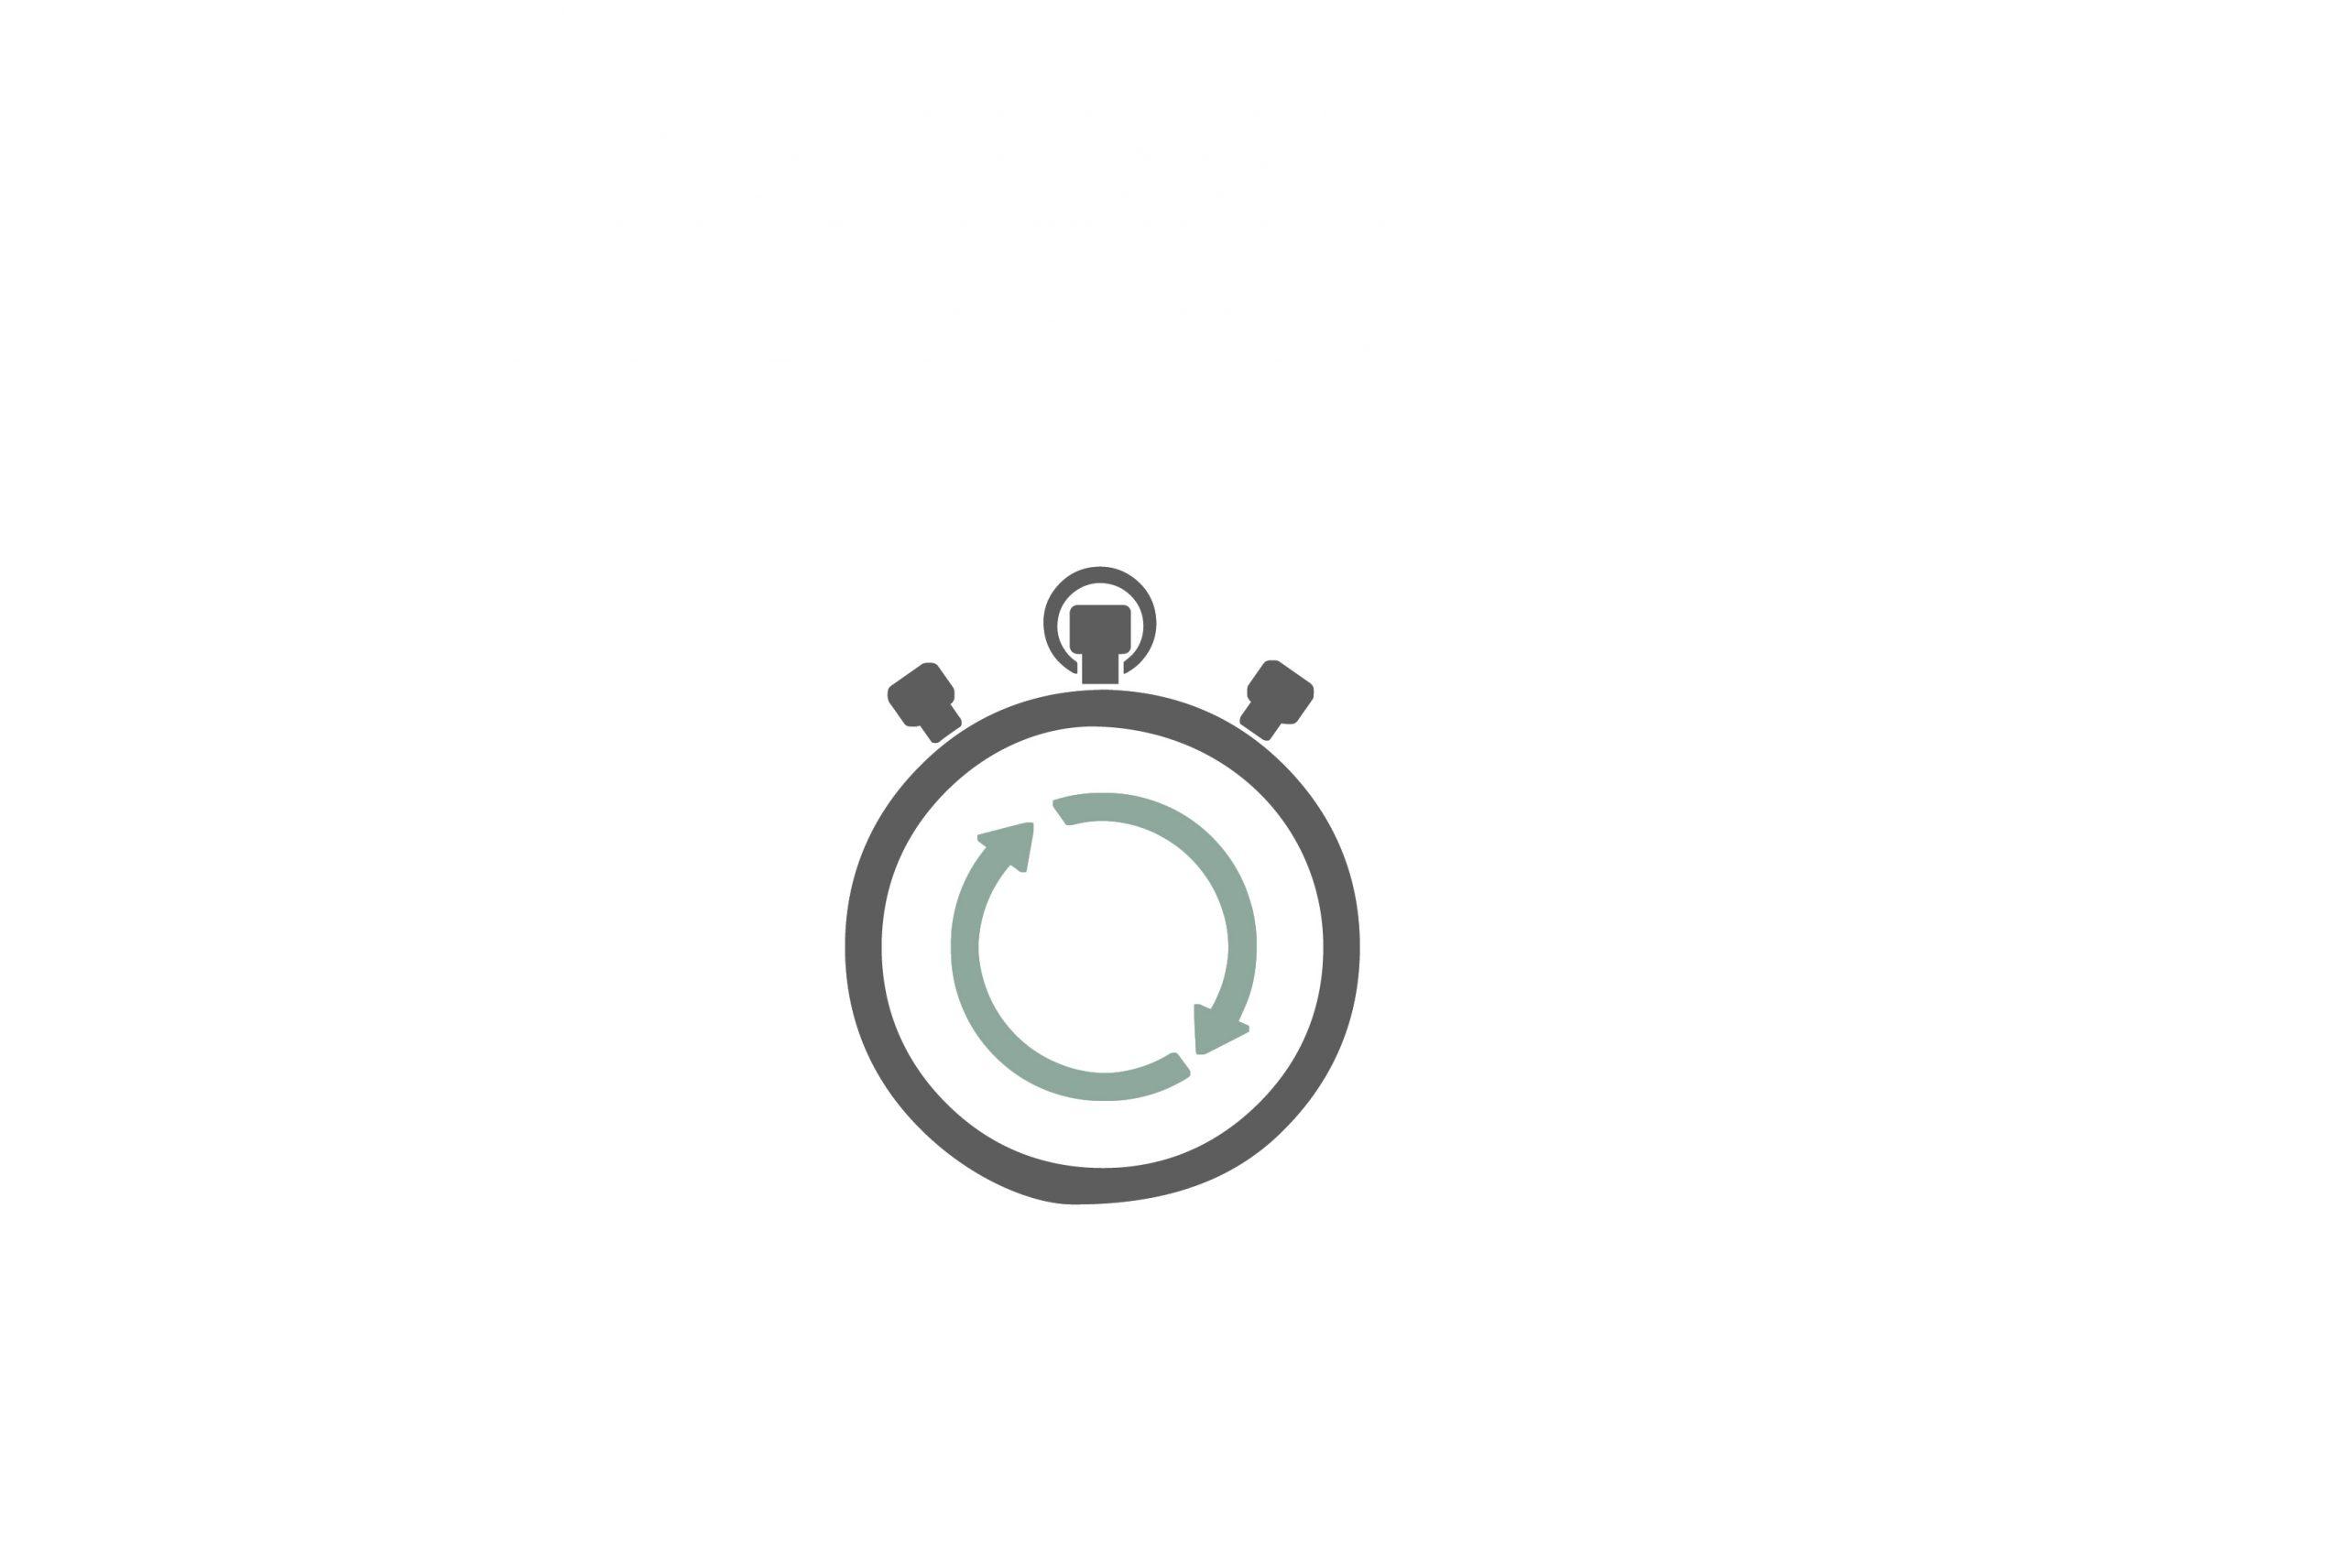 icone temps 7essentiels